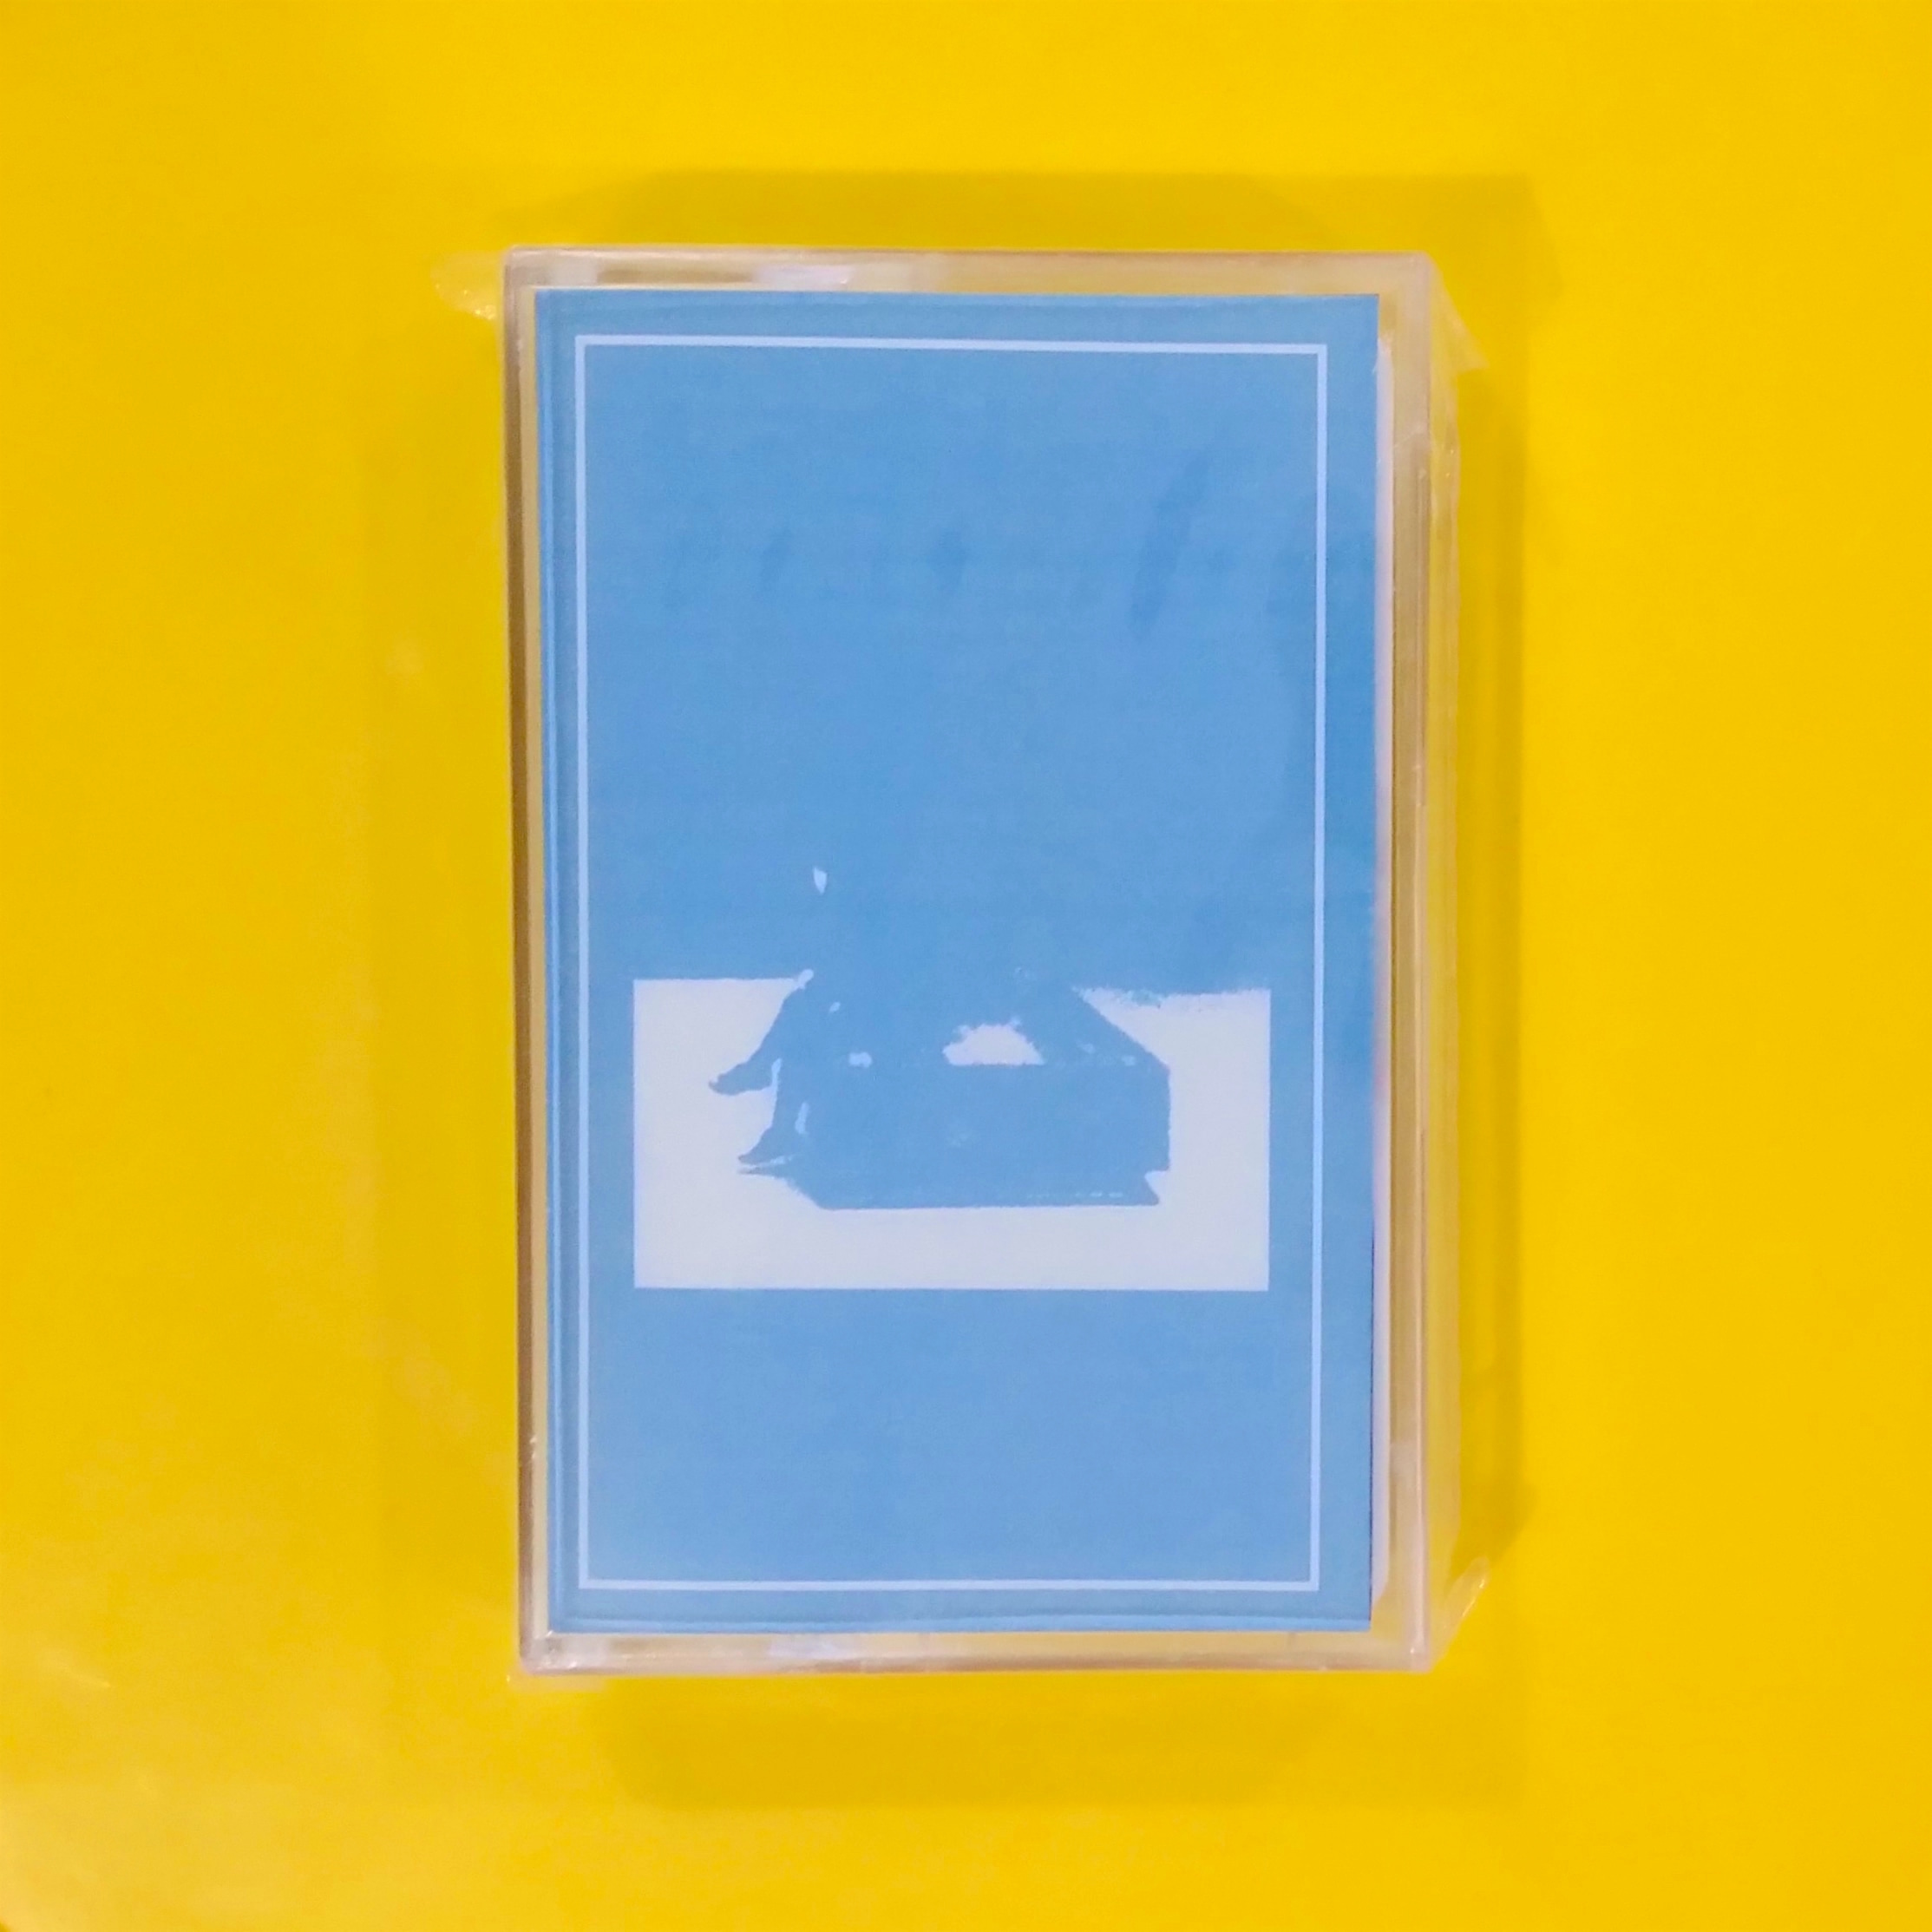 [SOLD] ❀ Foliage ❀ - Silence (Spirit Goth Records)